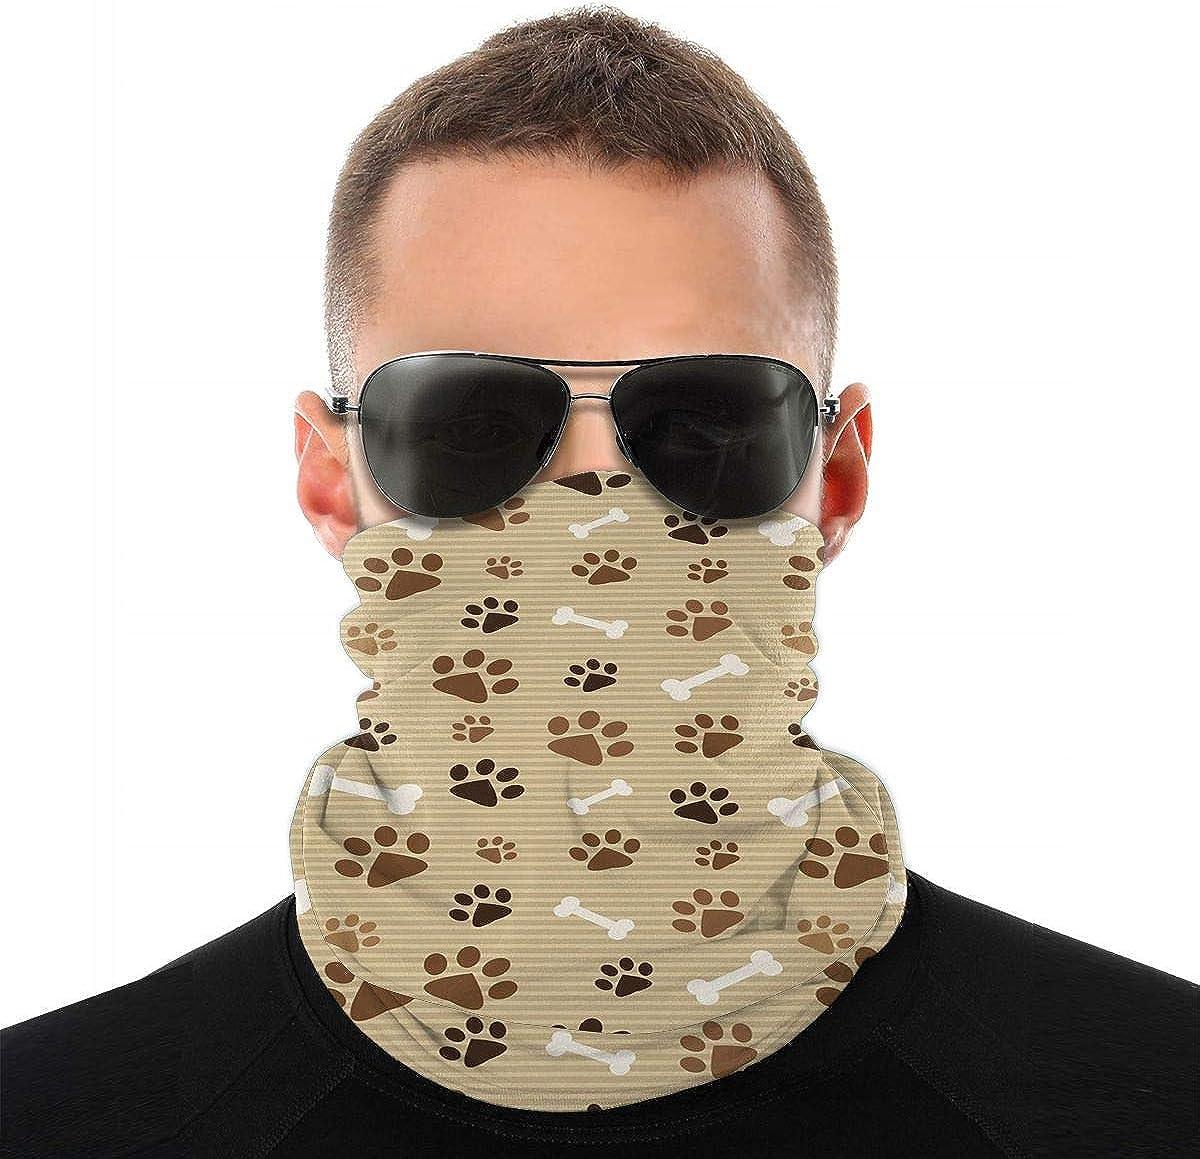 KiuLoam Animal Dog Paw Print Seamless Face Mask Bandanas Neck Gaiter for Men and Women, Multifunction Headband Scarf for Dust, Outdoors, Sports